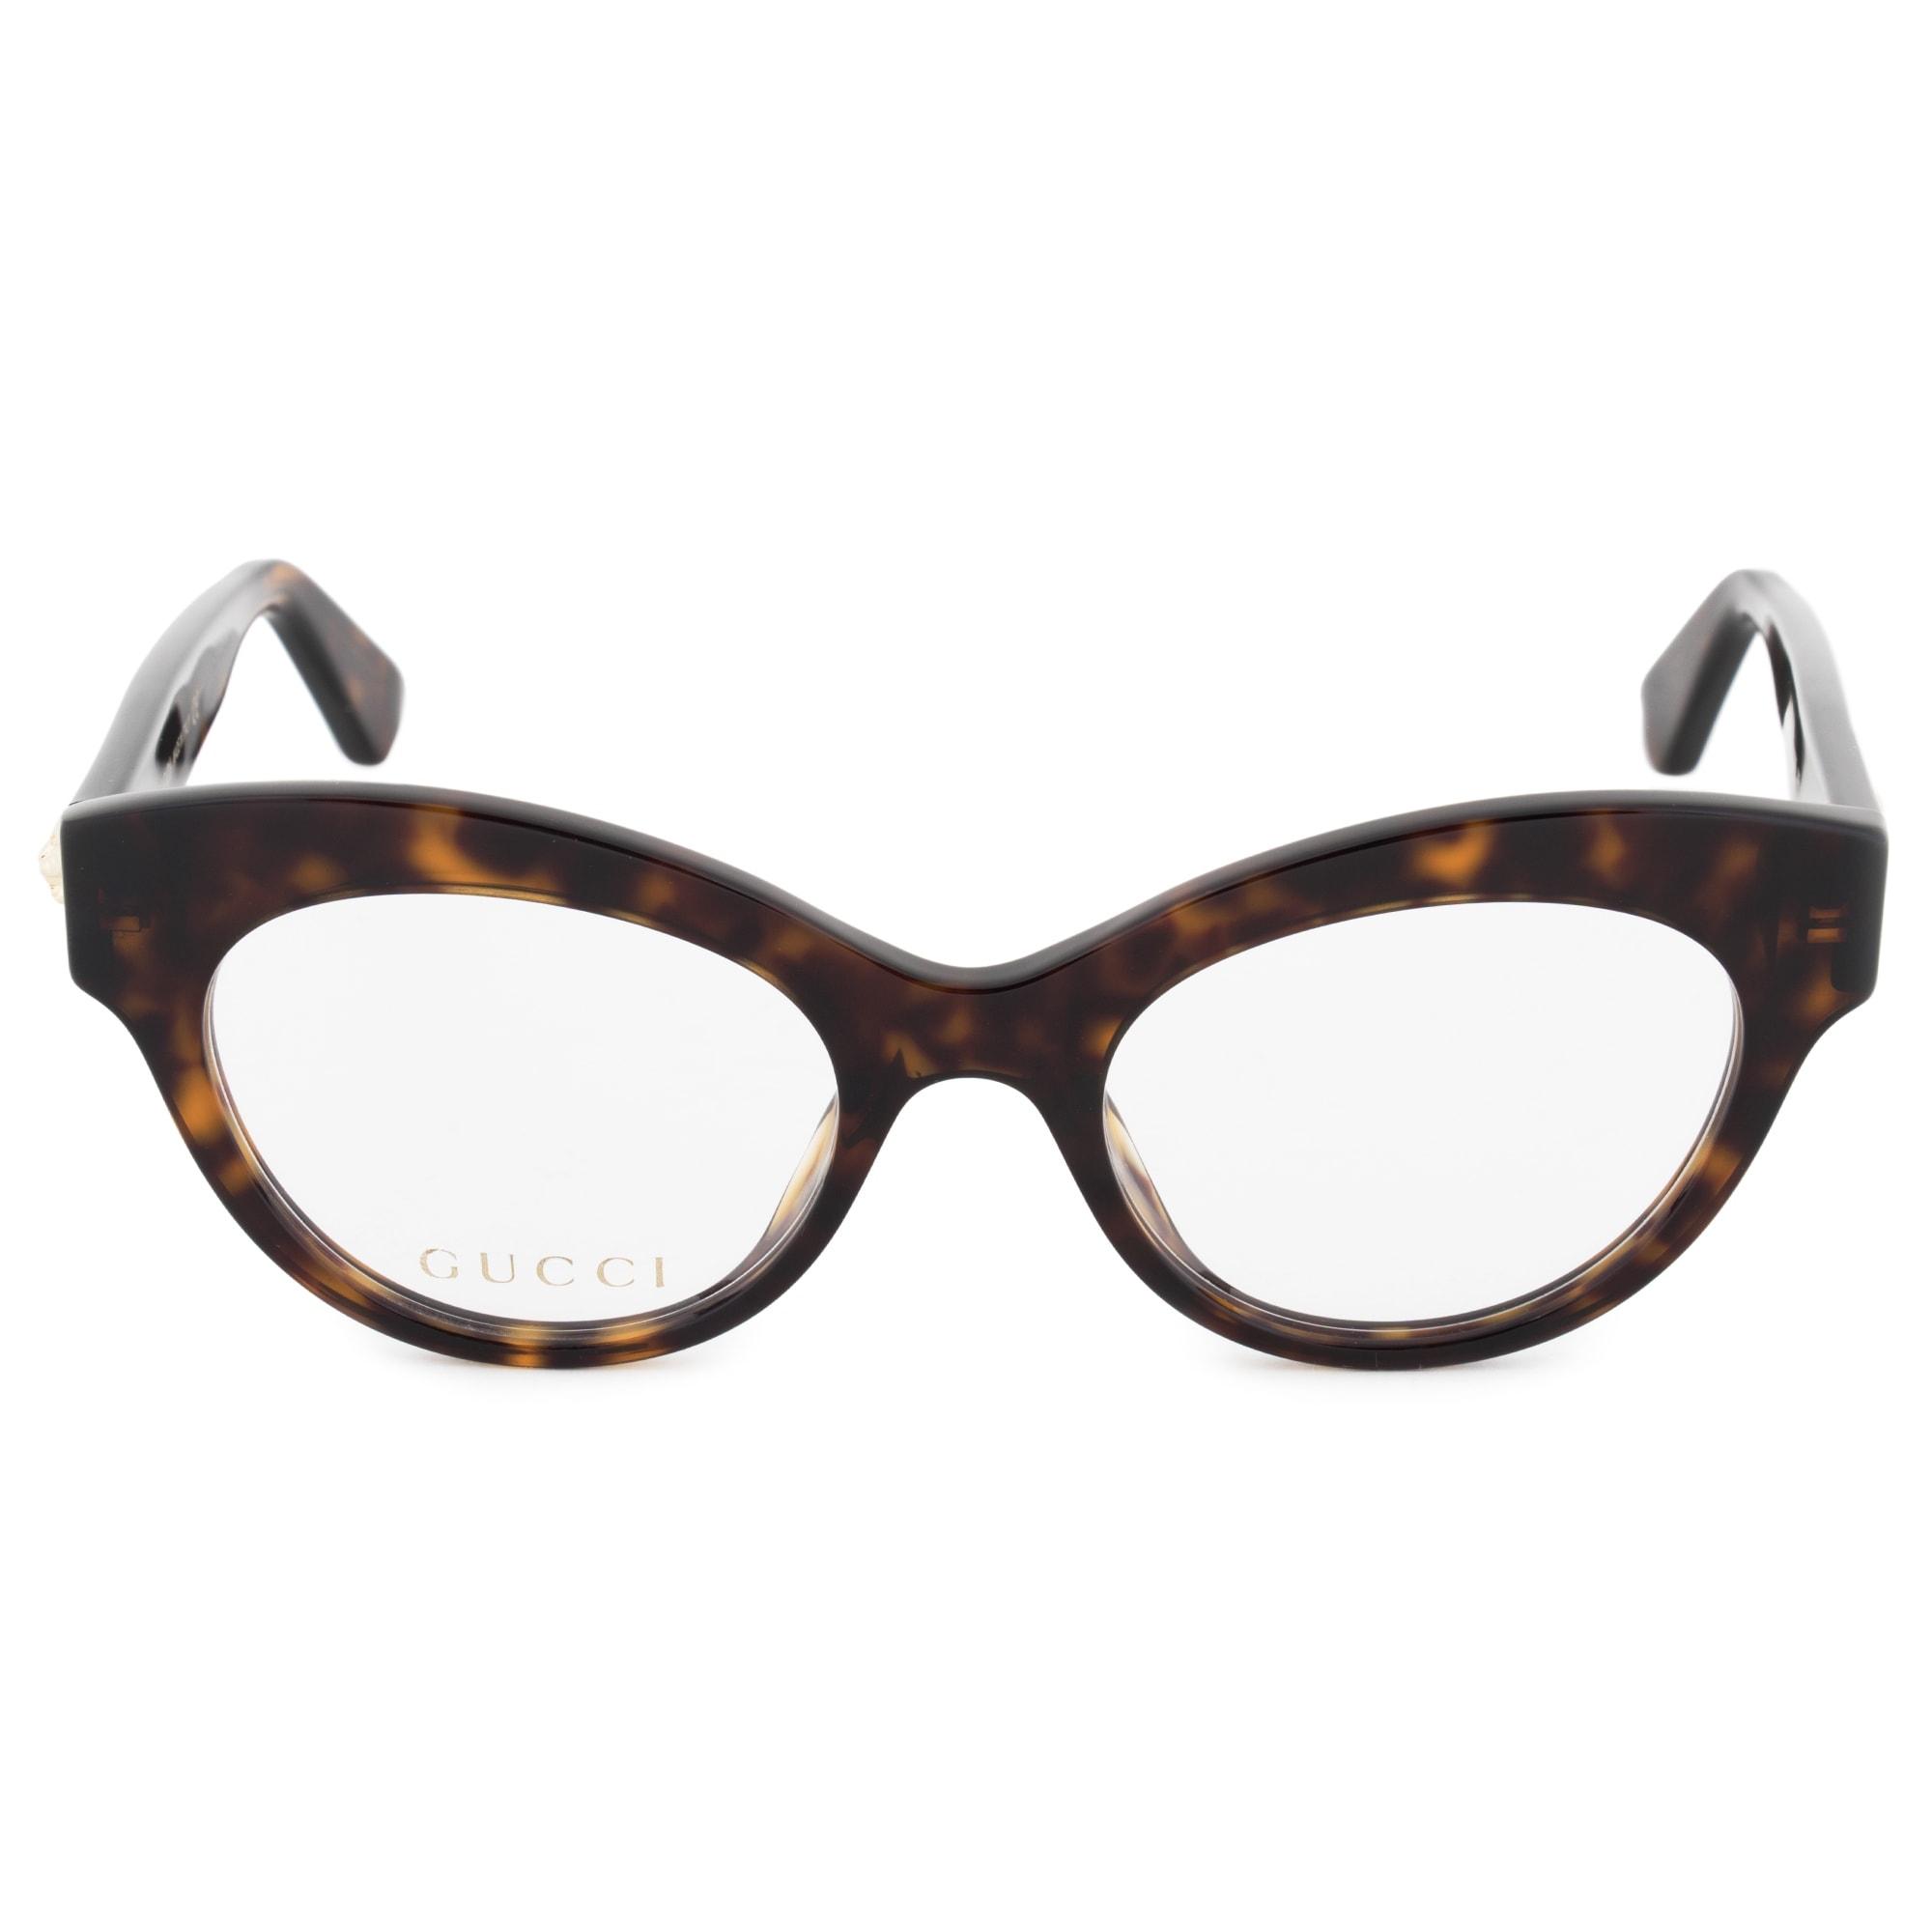 d7c73348628 Shop Gucci Gucci Cat Eye Eyeglass Frames GG0030O 002 49 - Free ...